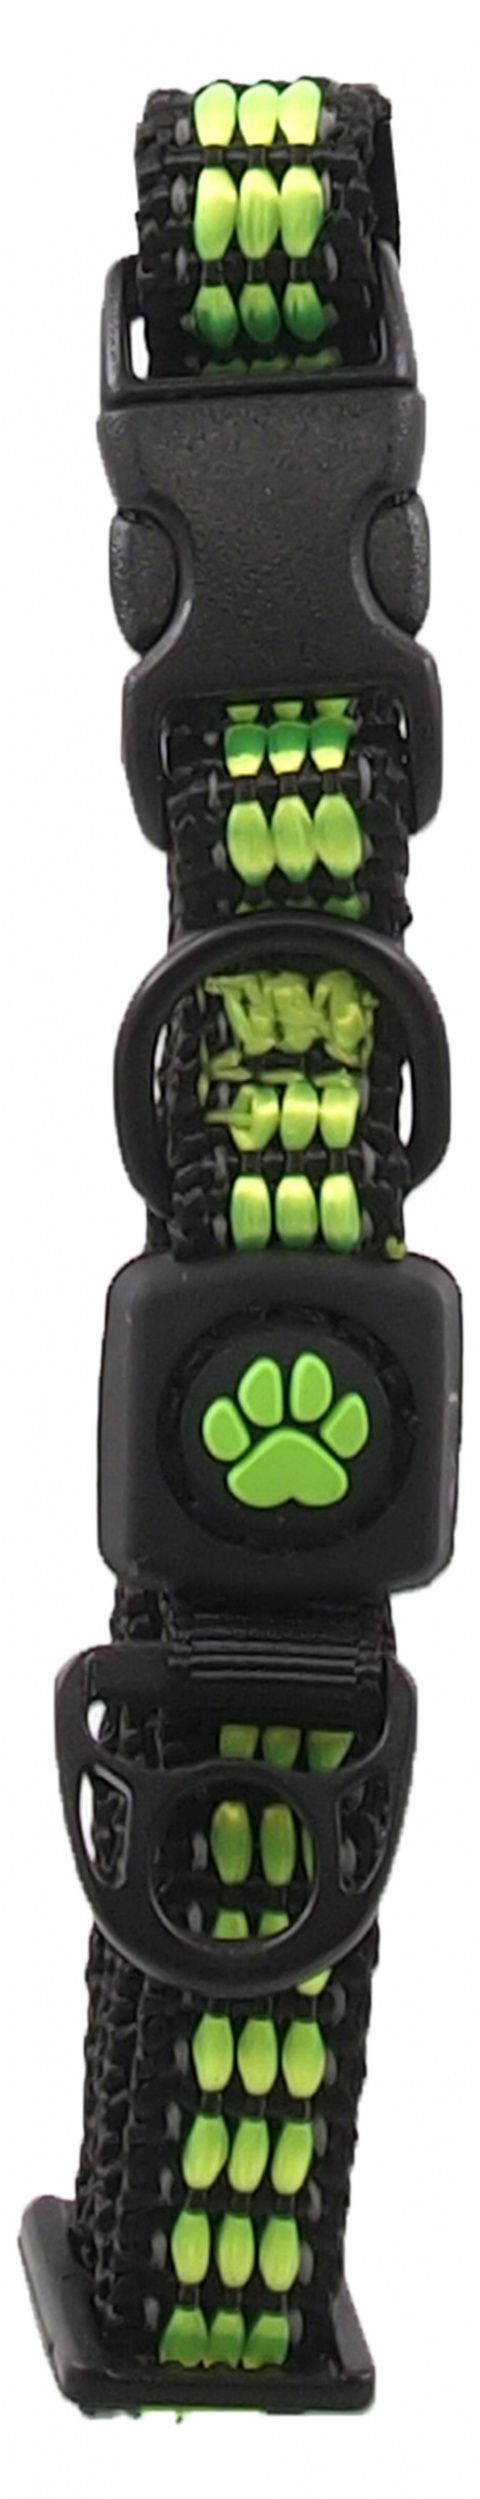 Obojek Active Dog Strong XS limetka 1x21-30cm